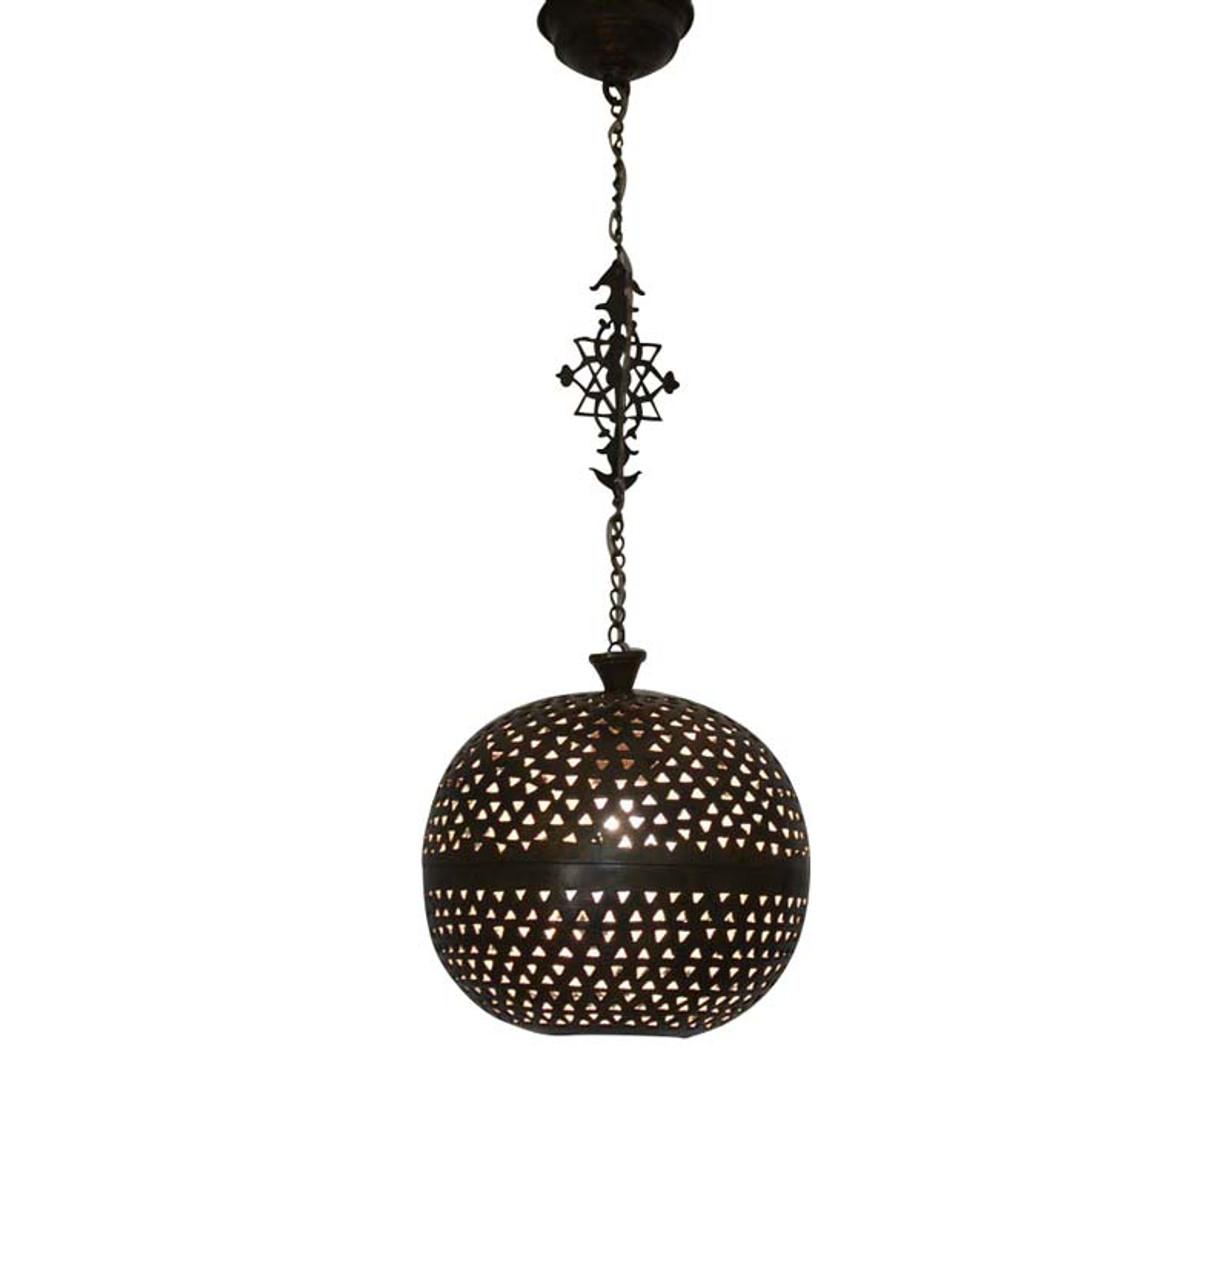 Moroccan pendant lights moroccan pendant light pendant light moroccan brass pendant light lamp oxidized aloadofball Gallery